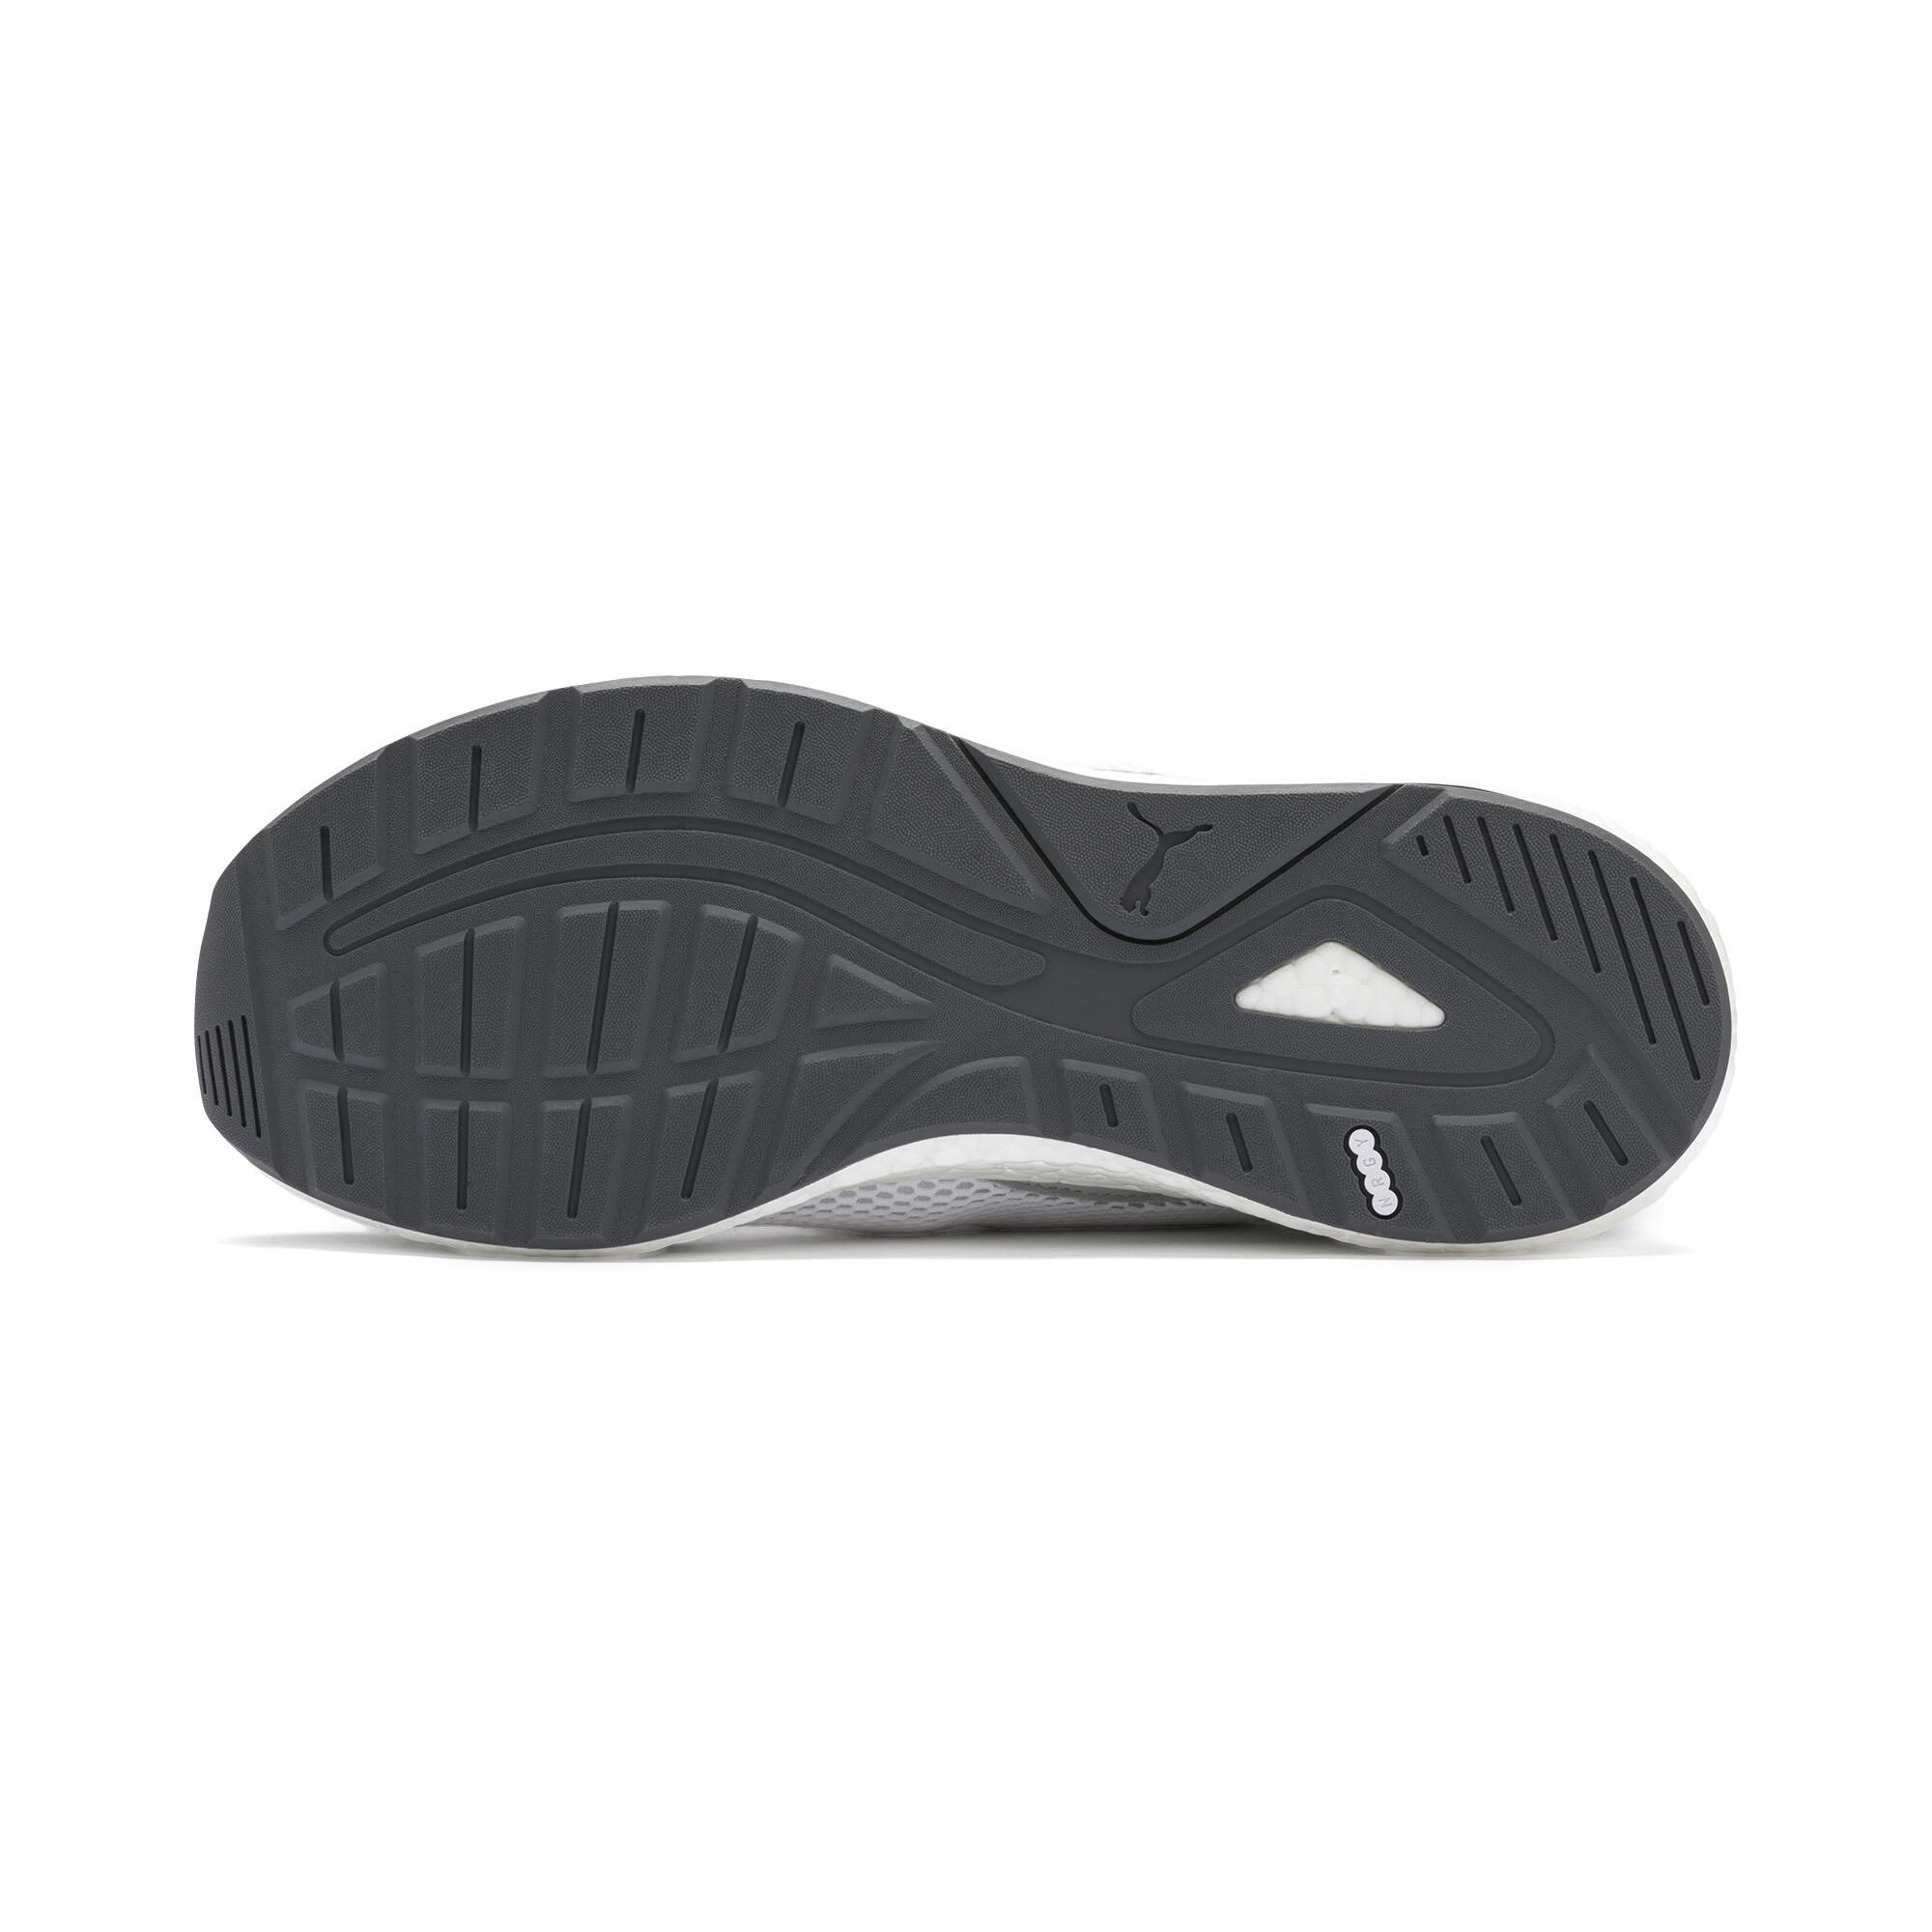 PUMA-NRGY-Neko-Skim-Men-s-Running-Shoes-Men-Shoe-Running thumbnail 6